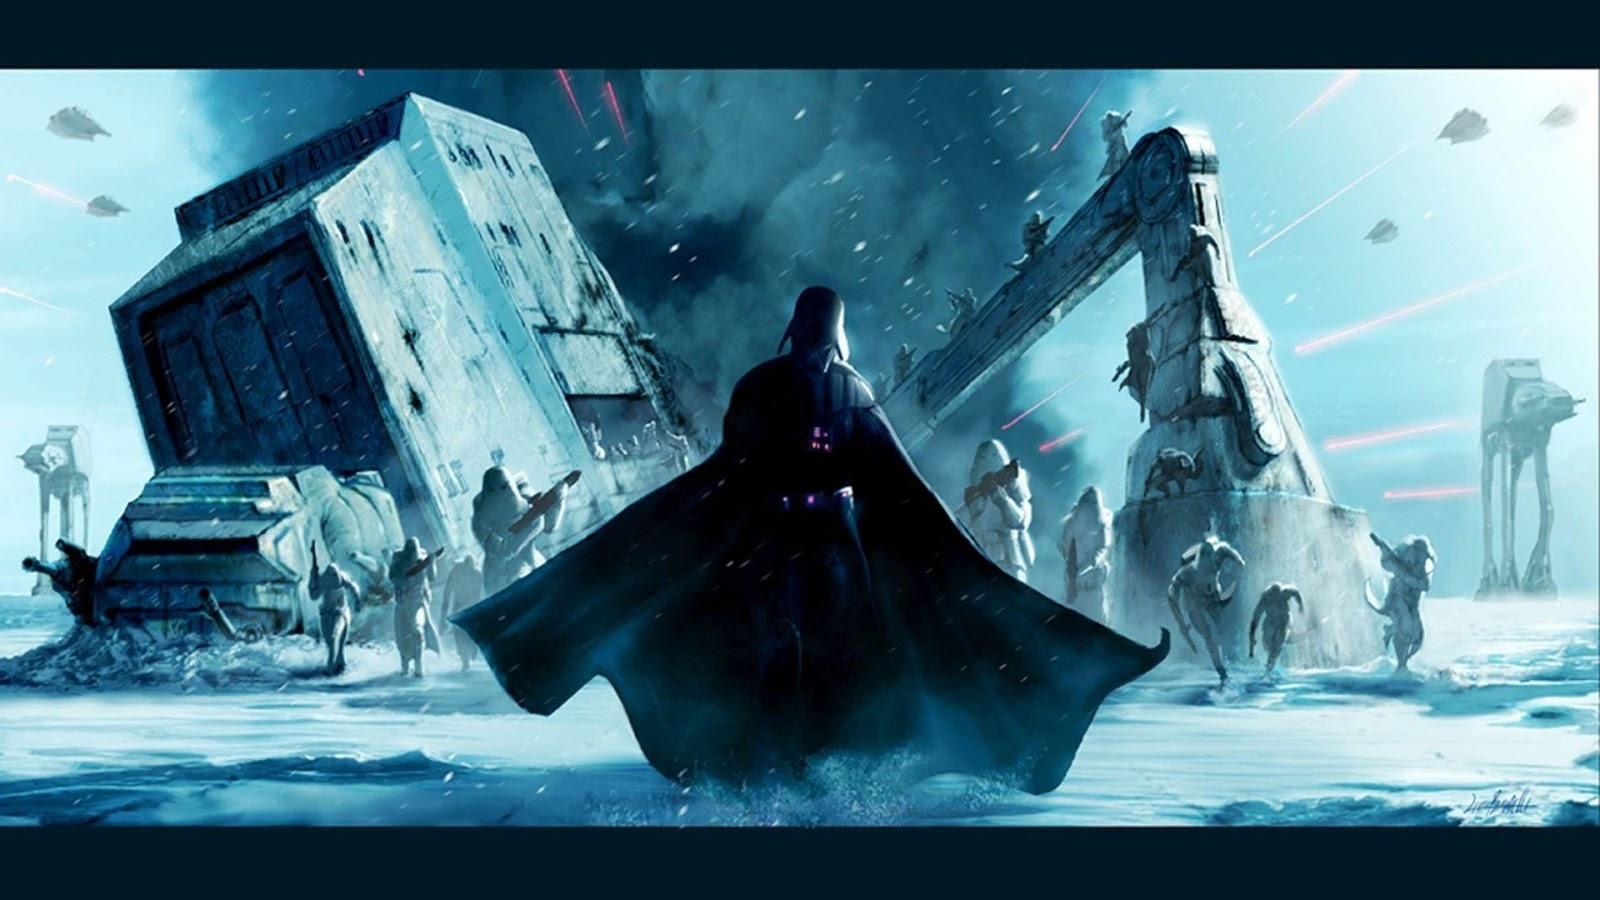 83 Star Wars Wallpaper Hd 1080p Wallpaper Carax